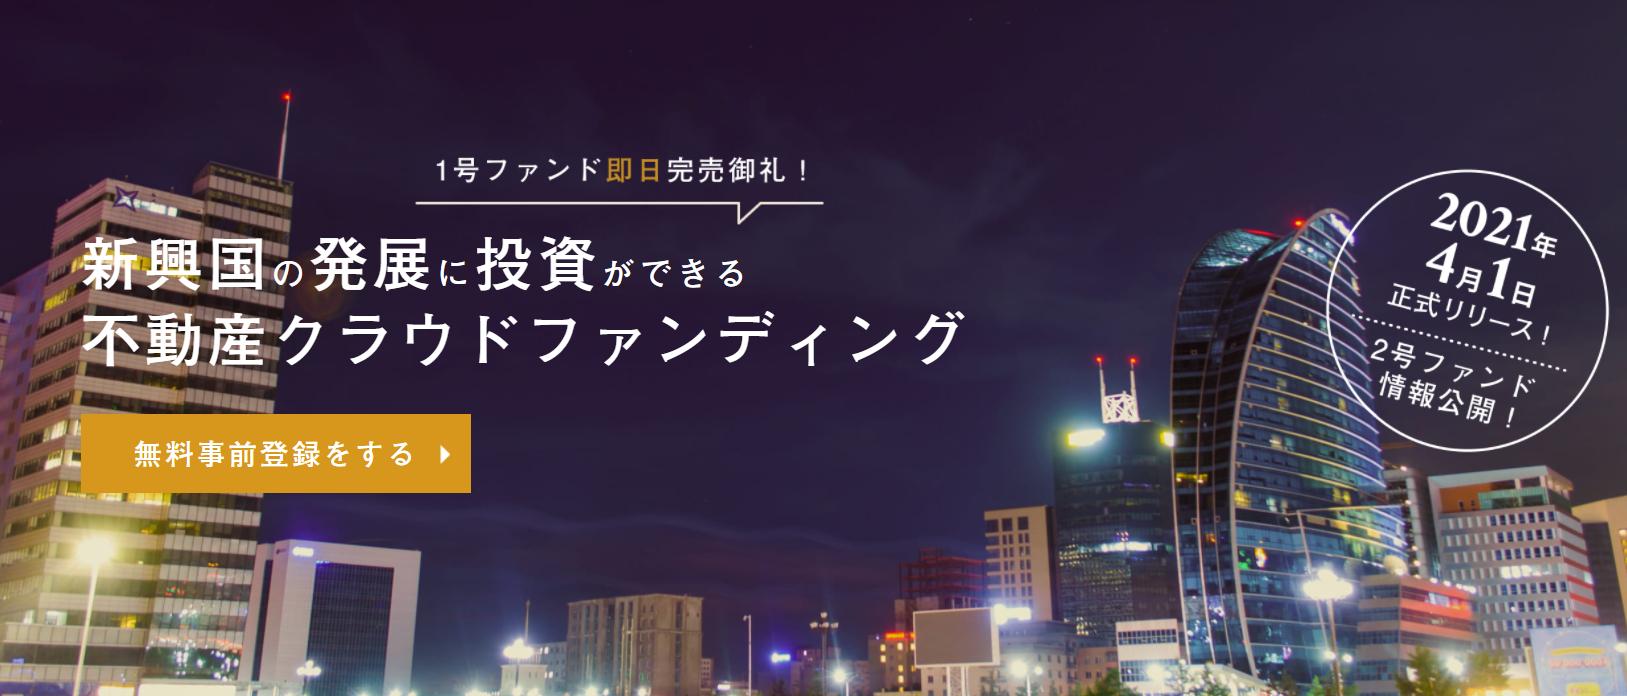 SnapCrab_NoName_2021-3-7_11-12-34_No-00.png